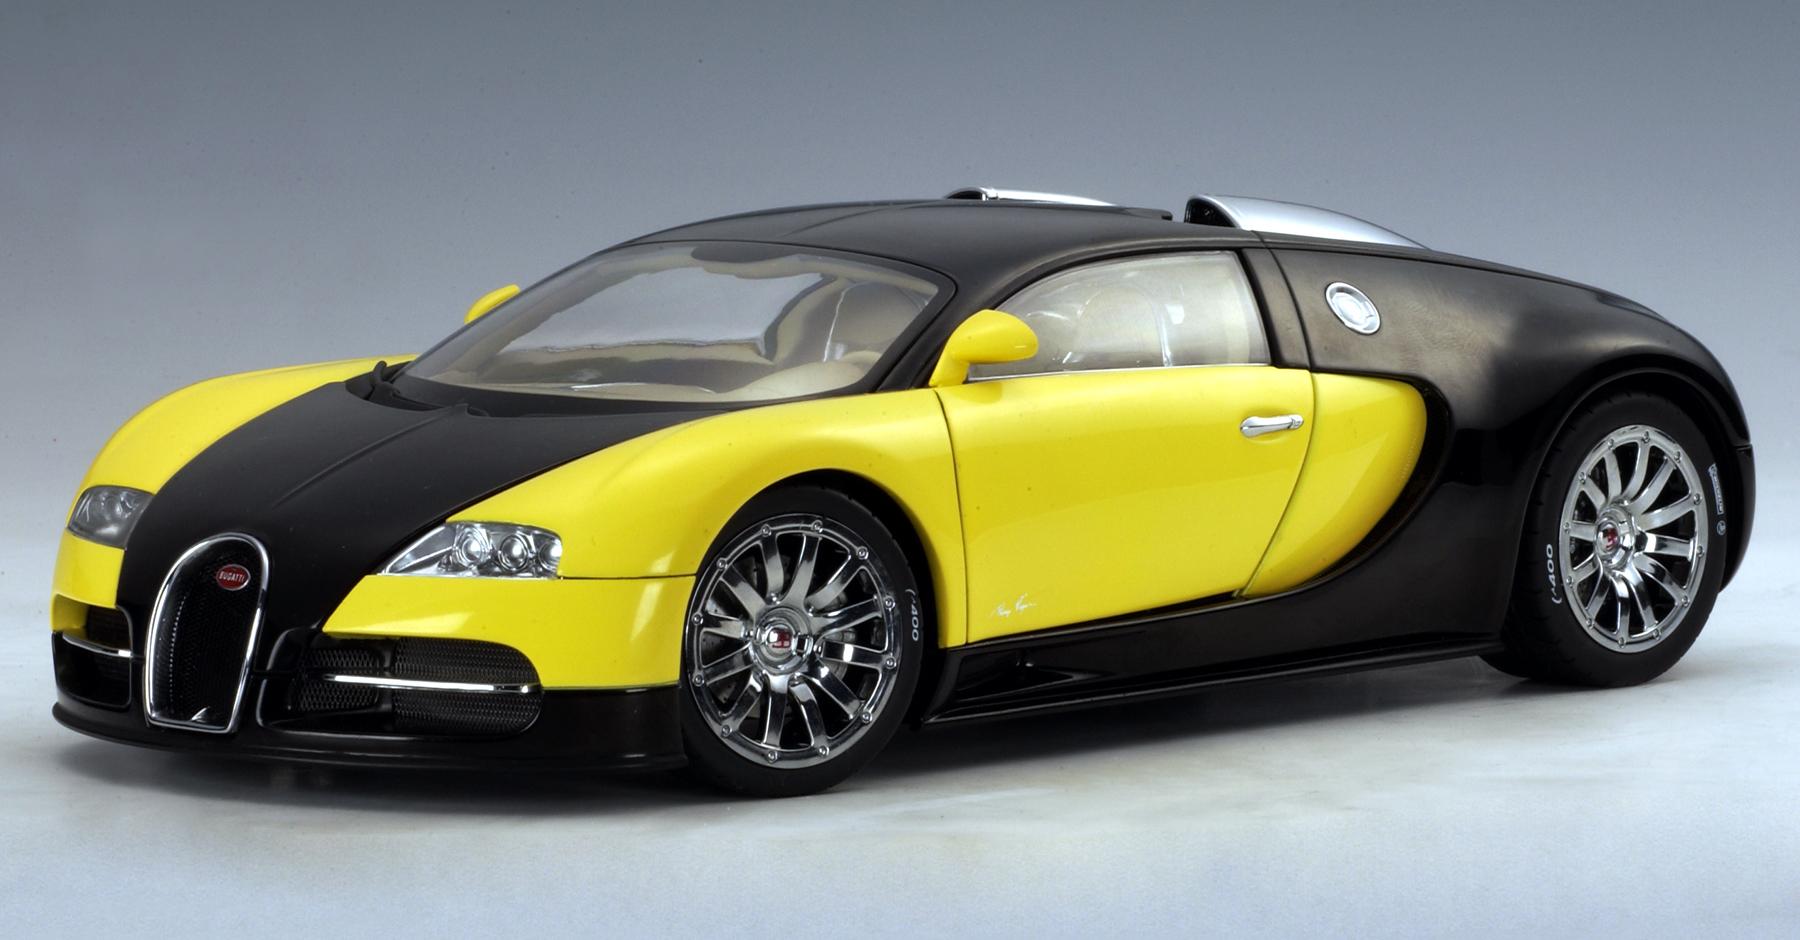 autoart bugatti eb 16 4 veyron show car black yellow 70904 in 1 18 scale mdiecast. Black Bedroom Furniture Sets. Home Design Ideas